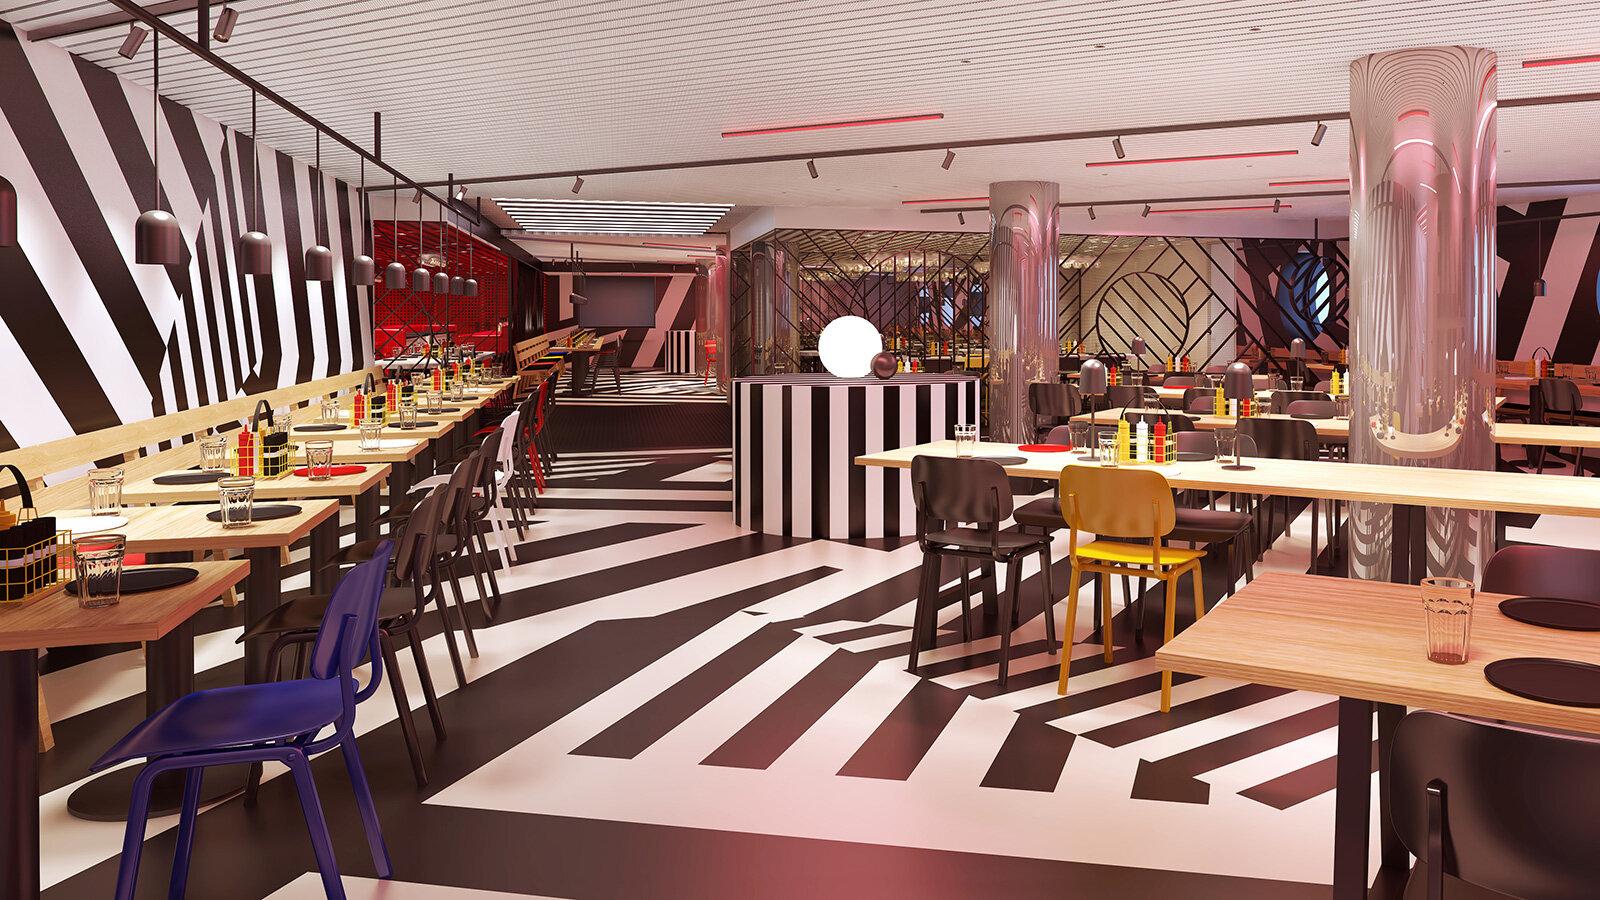 RDR-FNB-razzle-dazzle-restaurant-american-dining-v1-01-1600x900.jpg